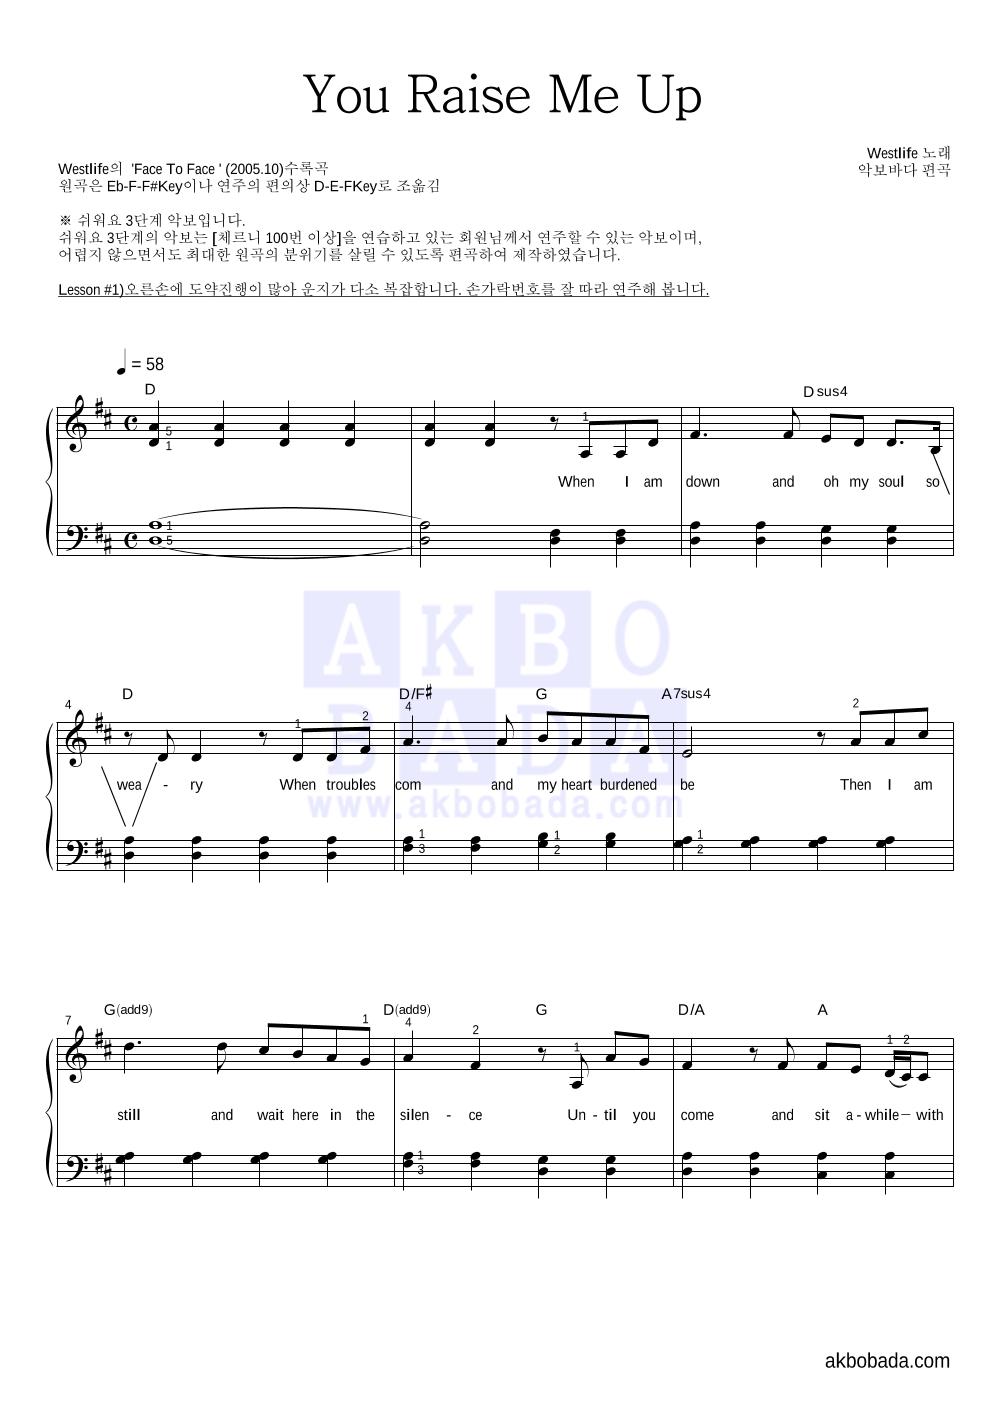 Westlife - You Raise Me Up 피아노2단-쉬워요 악보